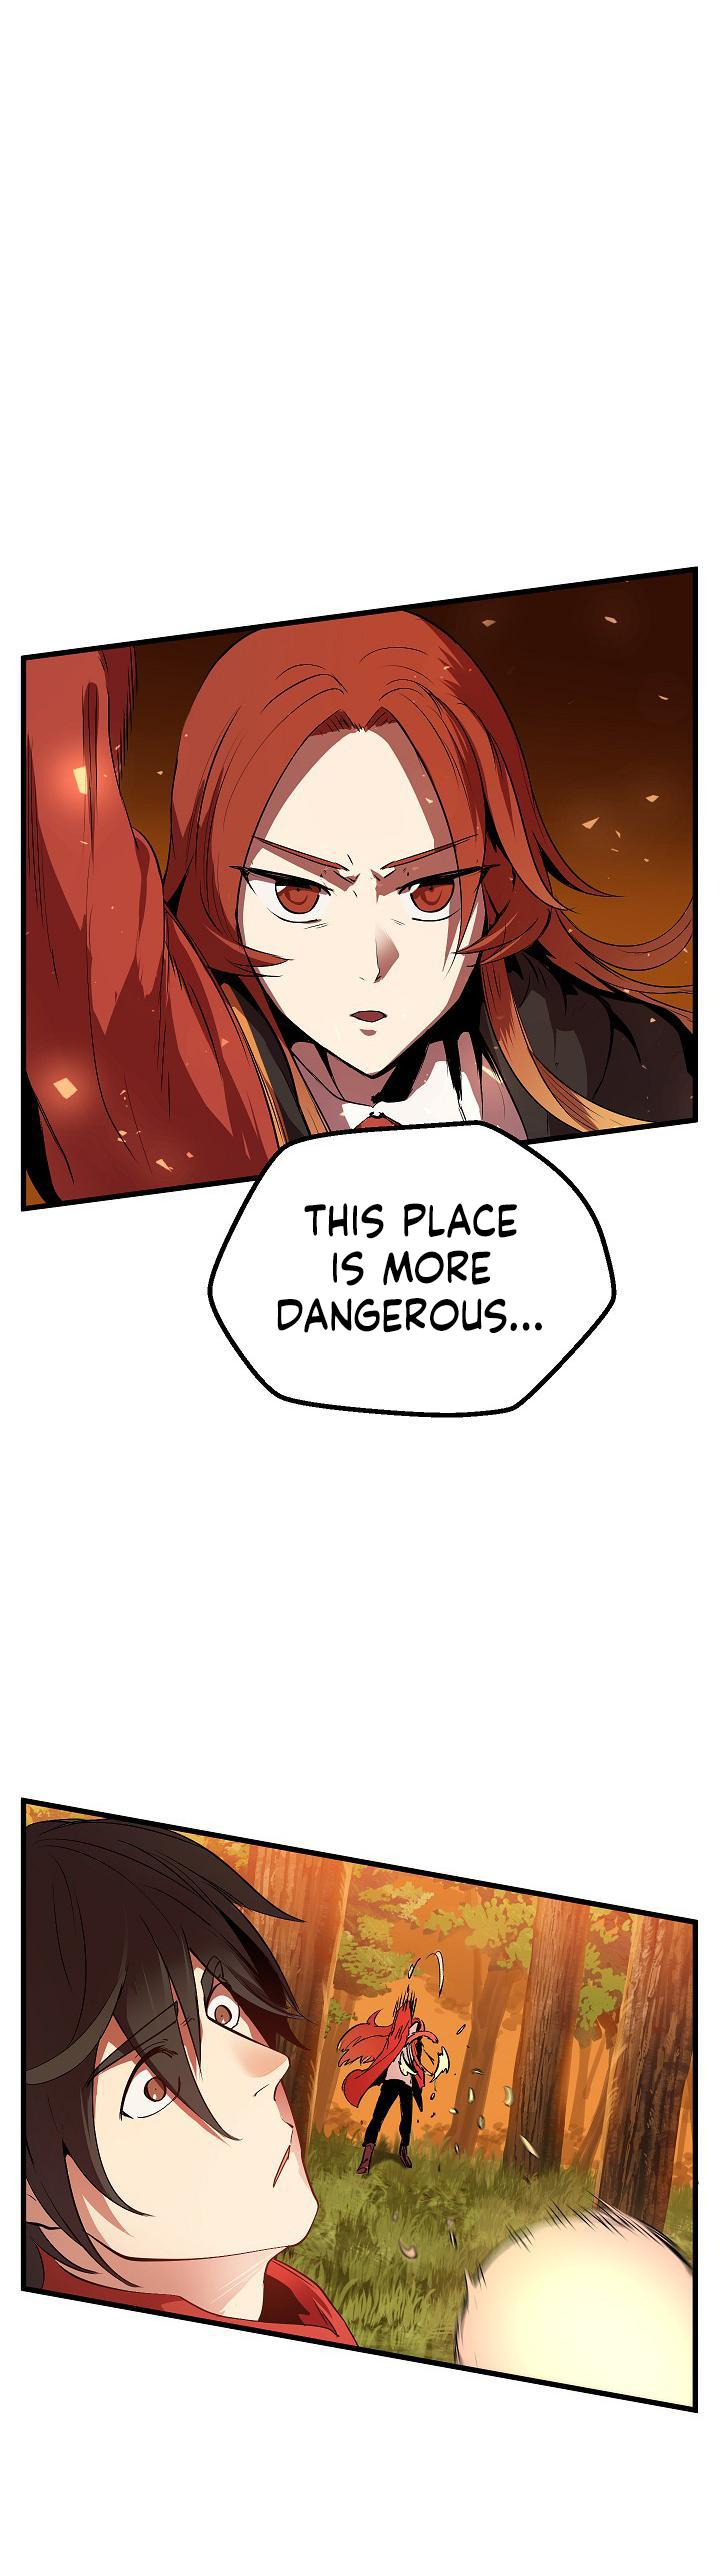 Survival Story Of A Sword King In A Fantasy World Vol.1 Chapter 16 page 4 - Mangakakalots.com